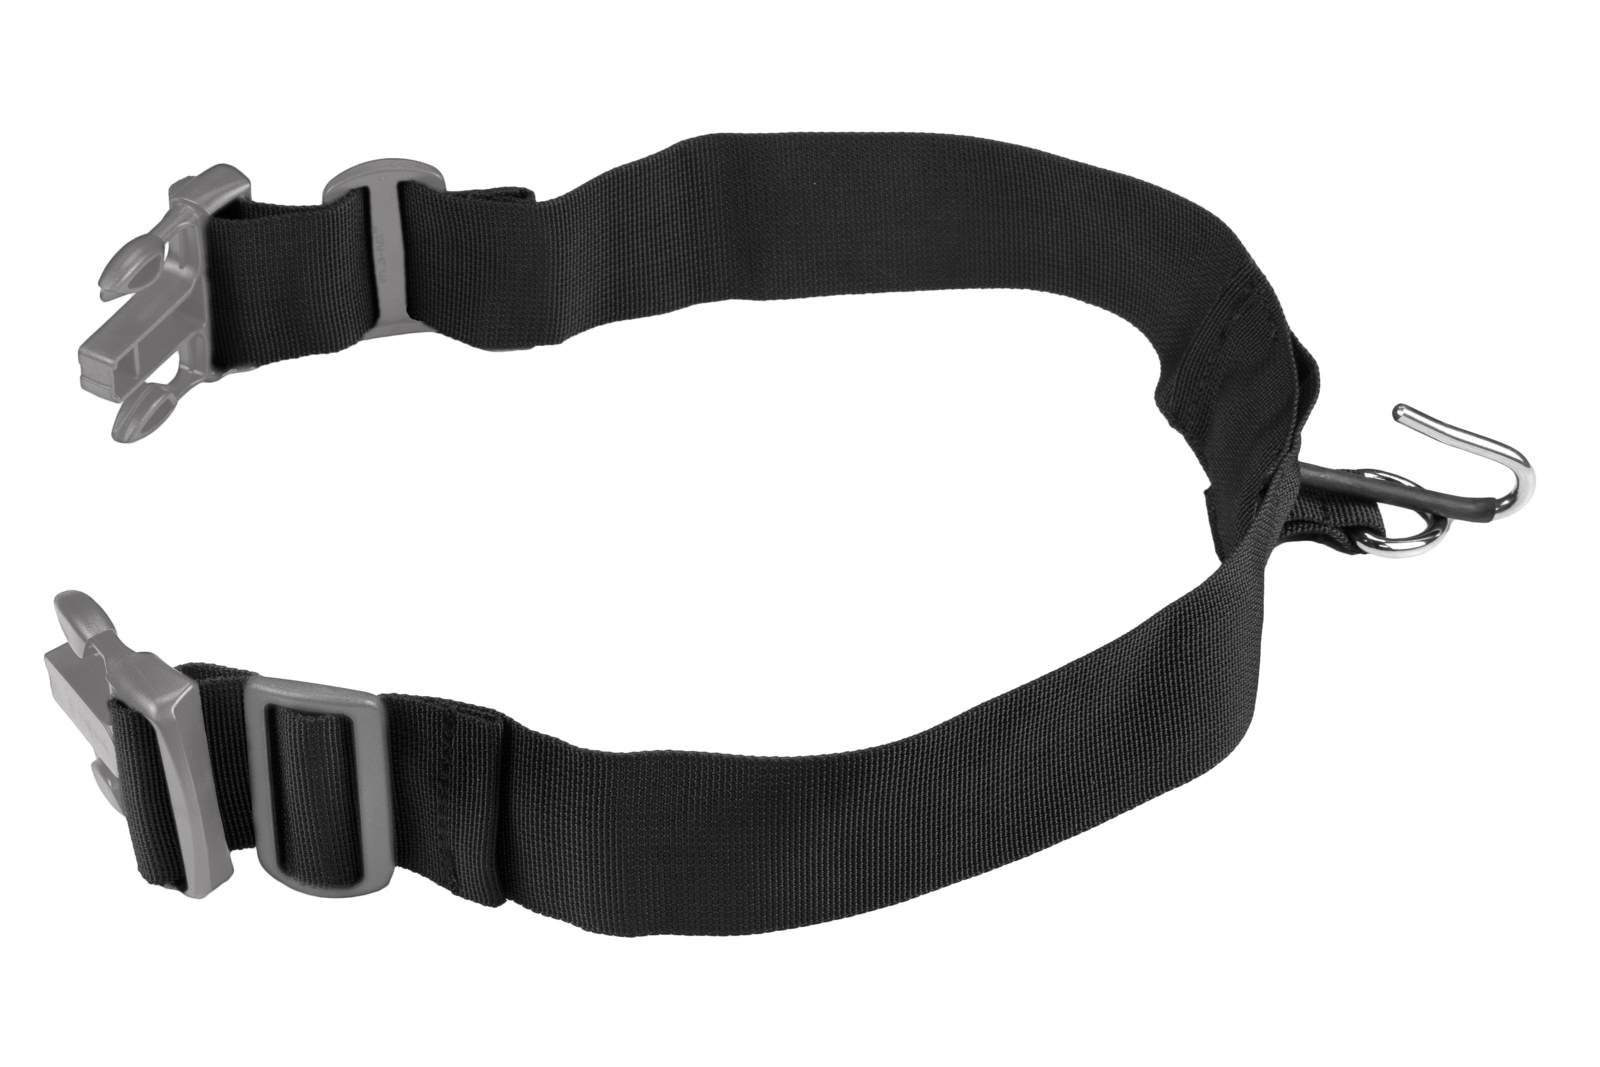 Trekking belt front piece